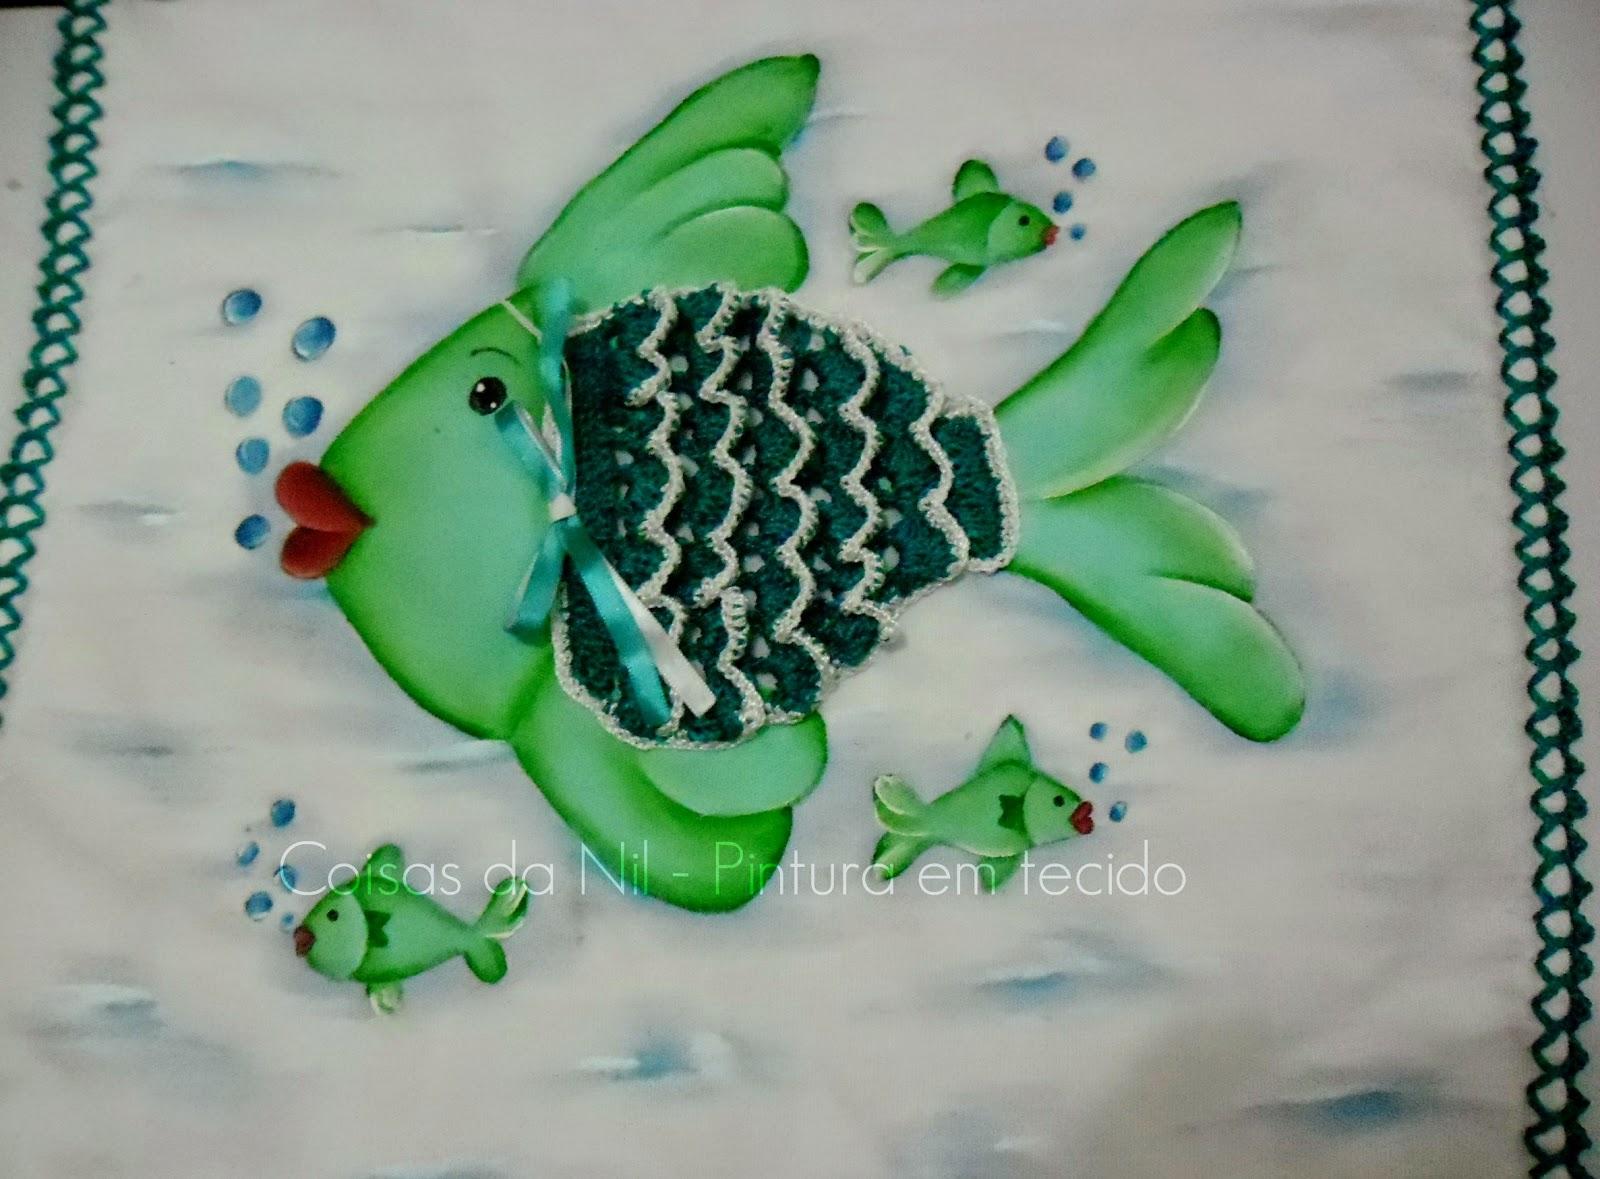 pano de copa com pintura de peixe com o corpo de croche